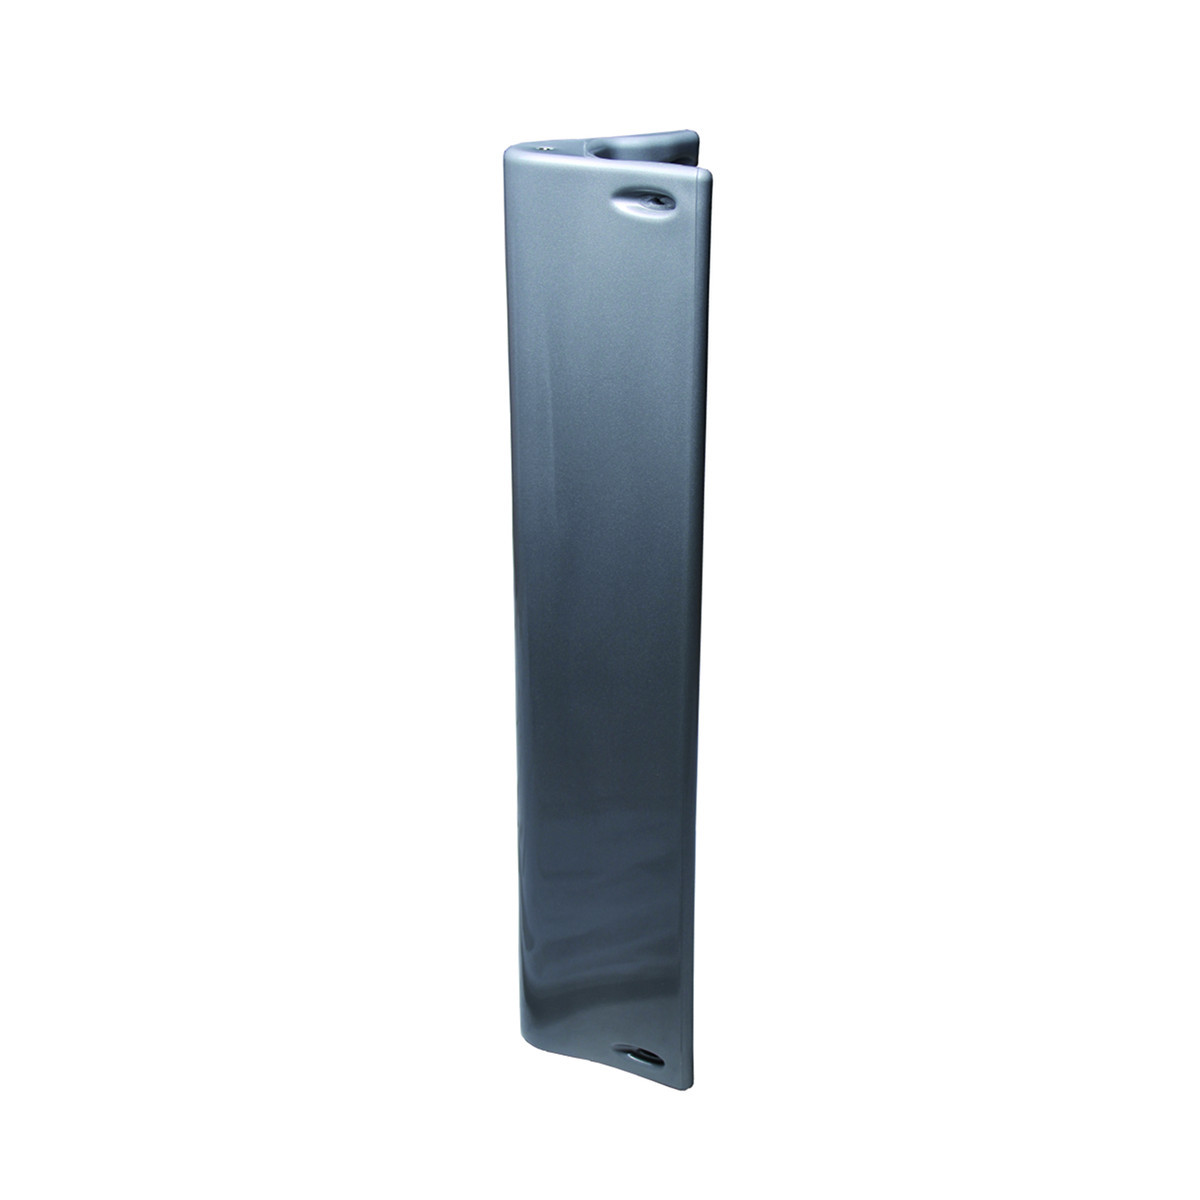 Talamex Boegfender V-Vorm, lengte 60cm, diameter 14cm - grijs